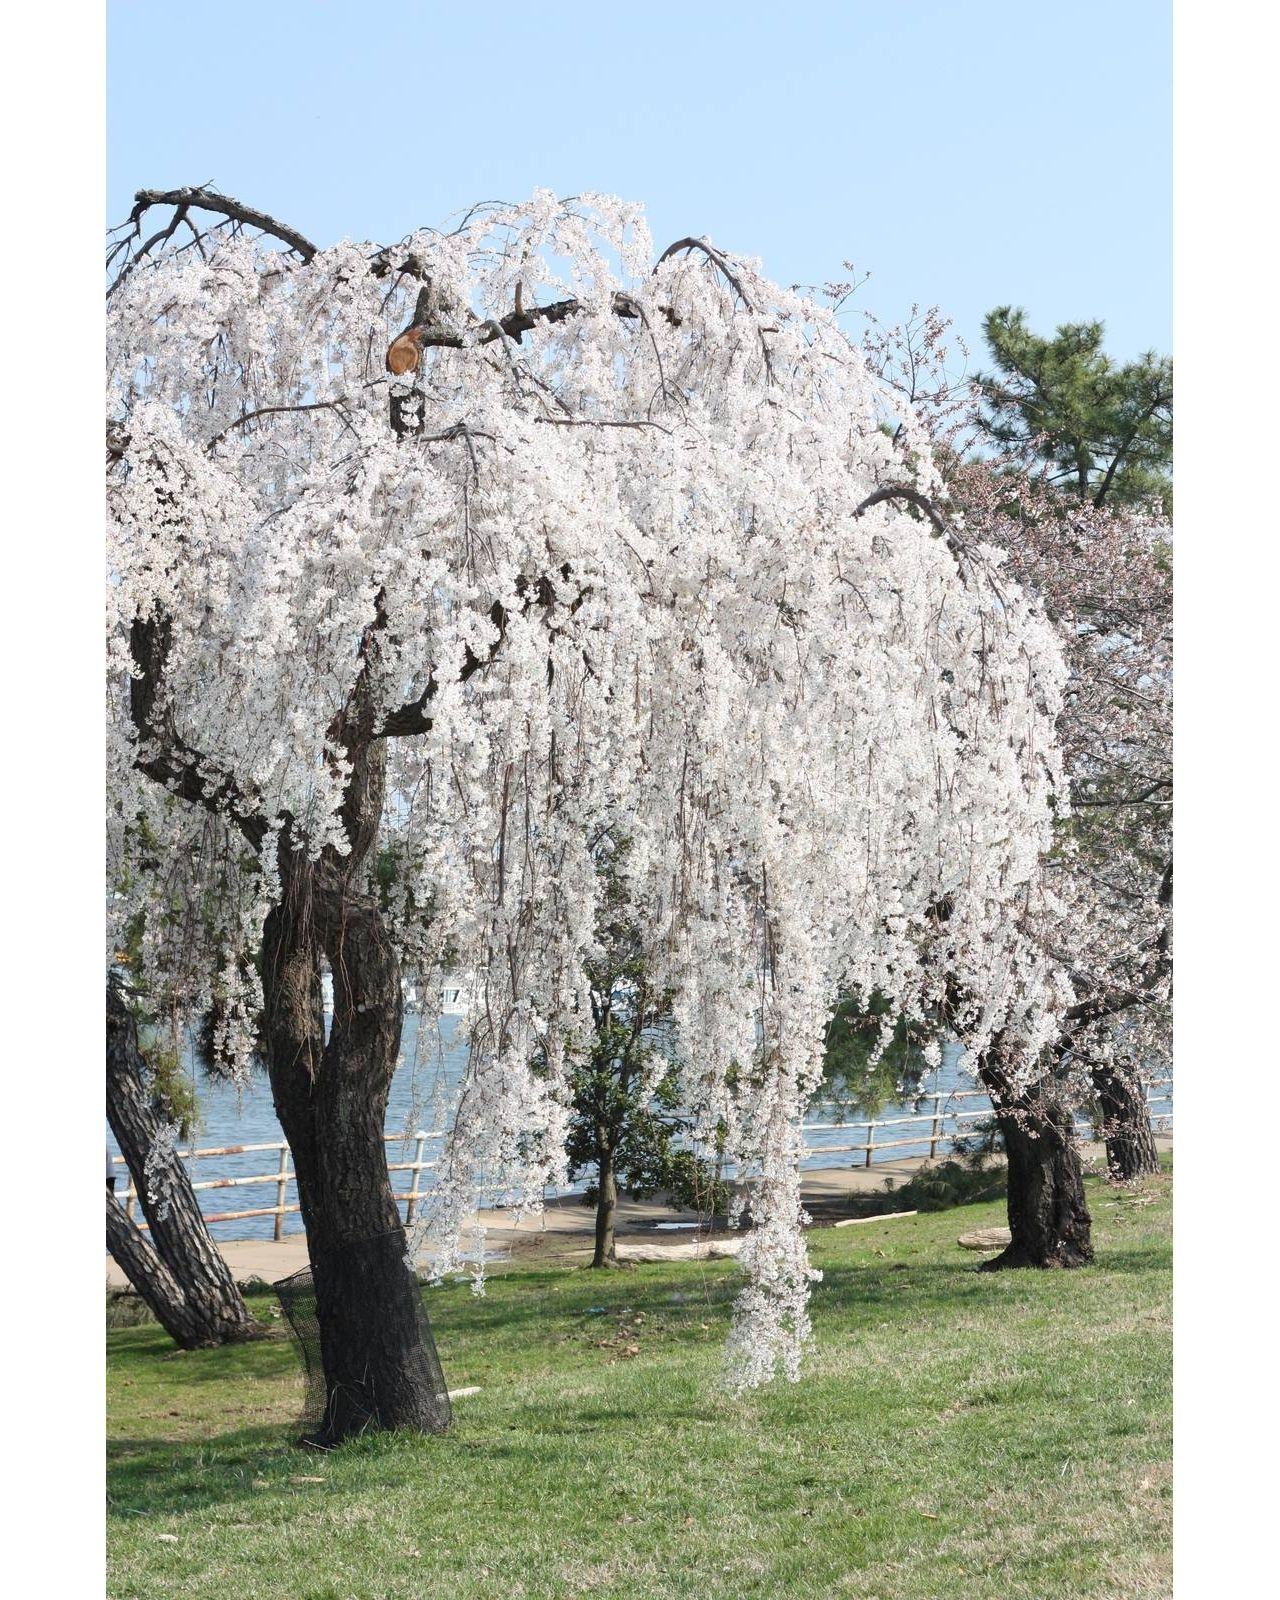 Jon Urbana On Instagram Nofilter Willow Trees Garden Weeping Cherry Tree Garden Trees